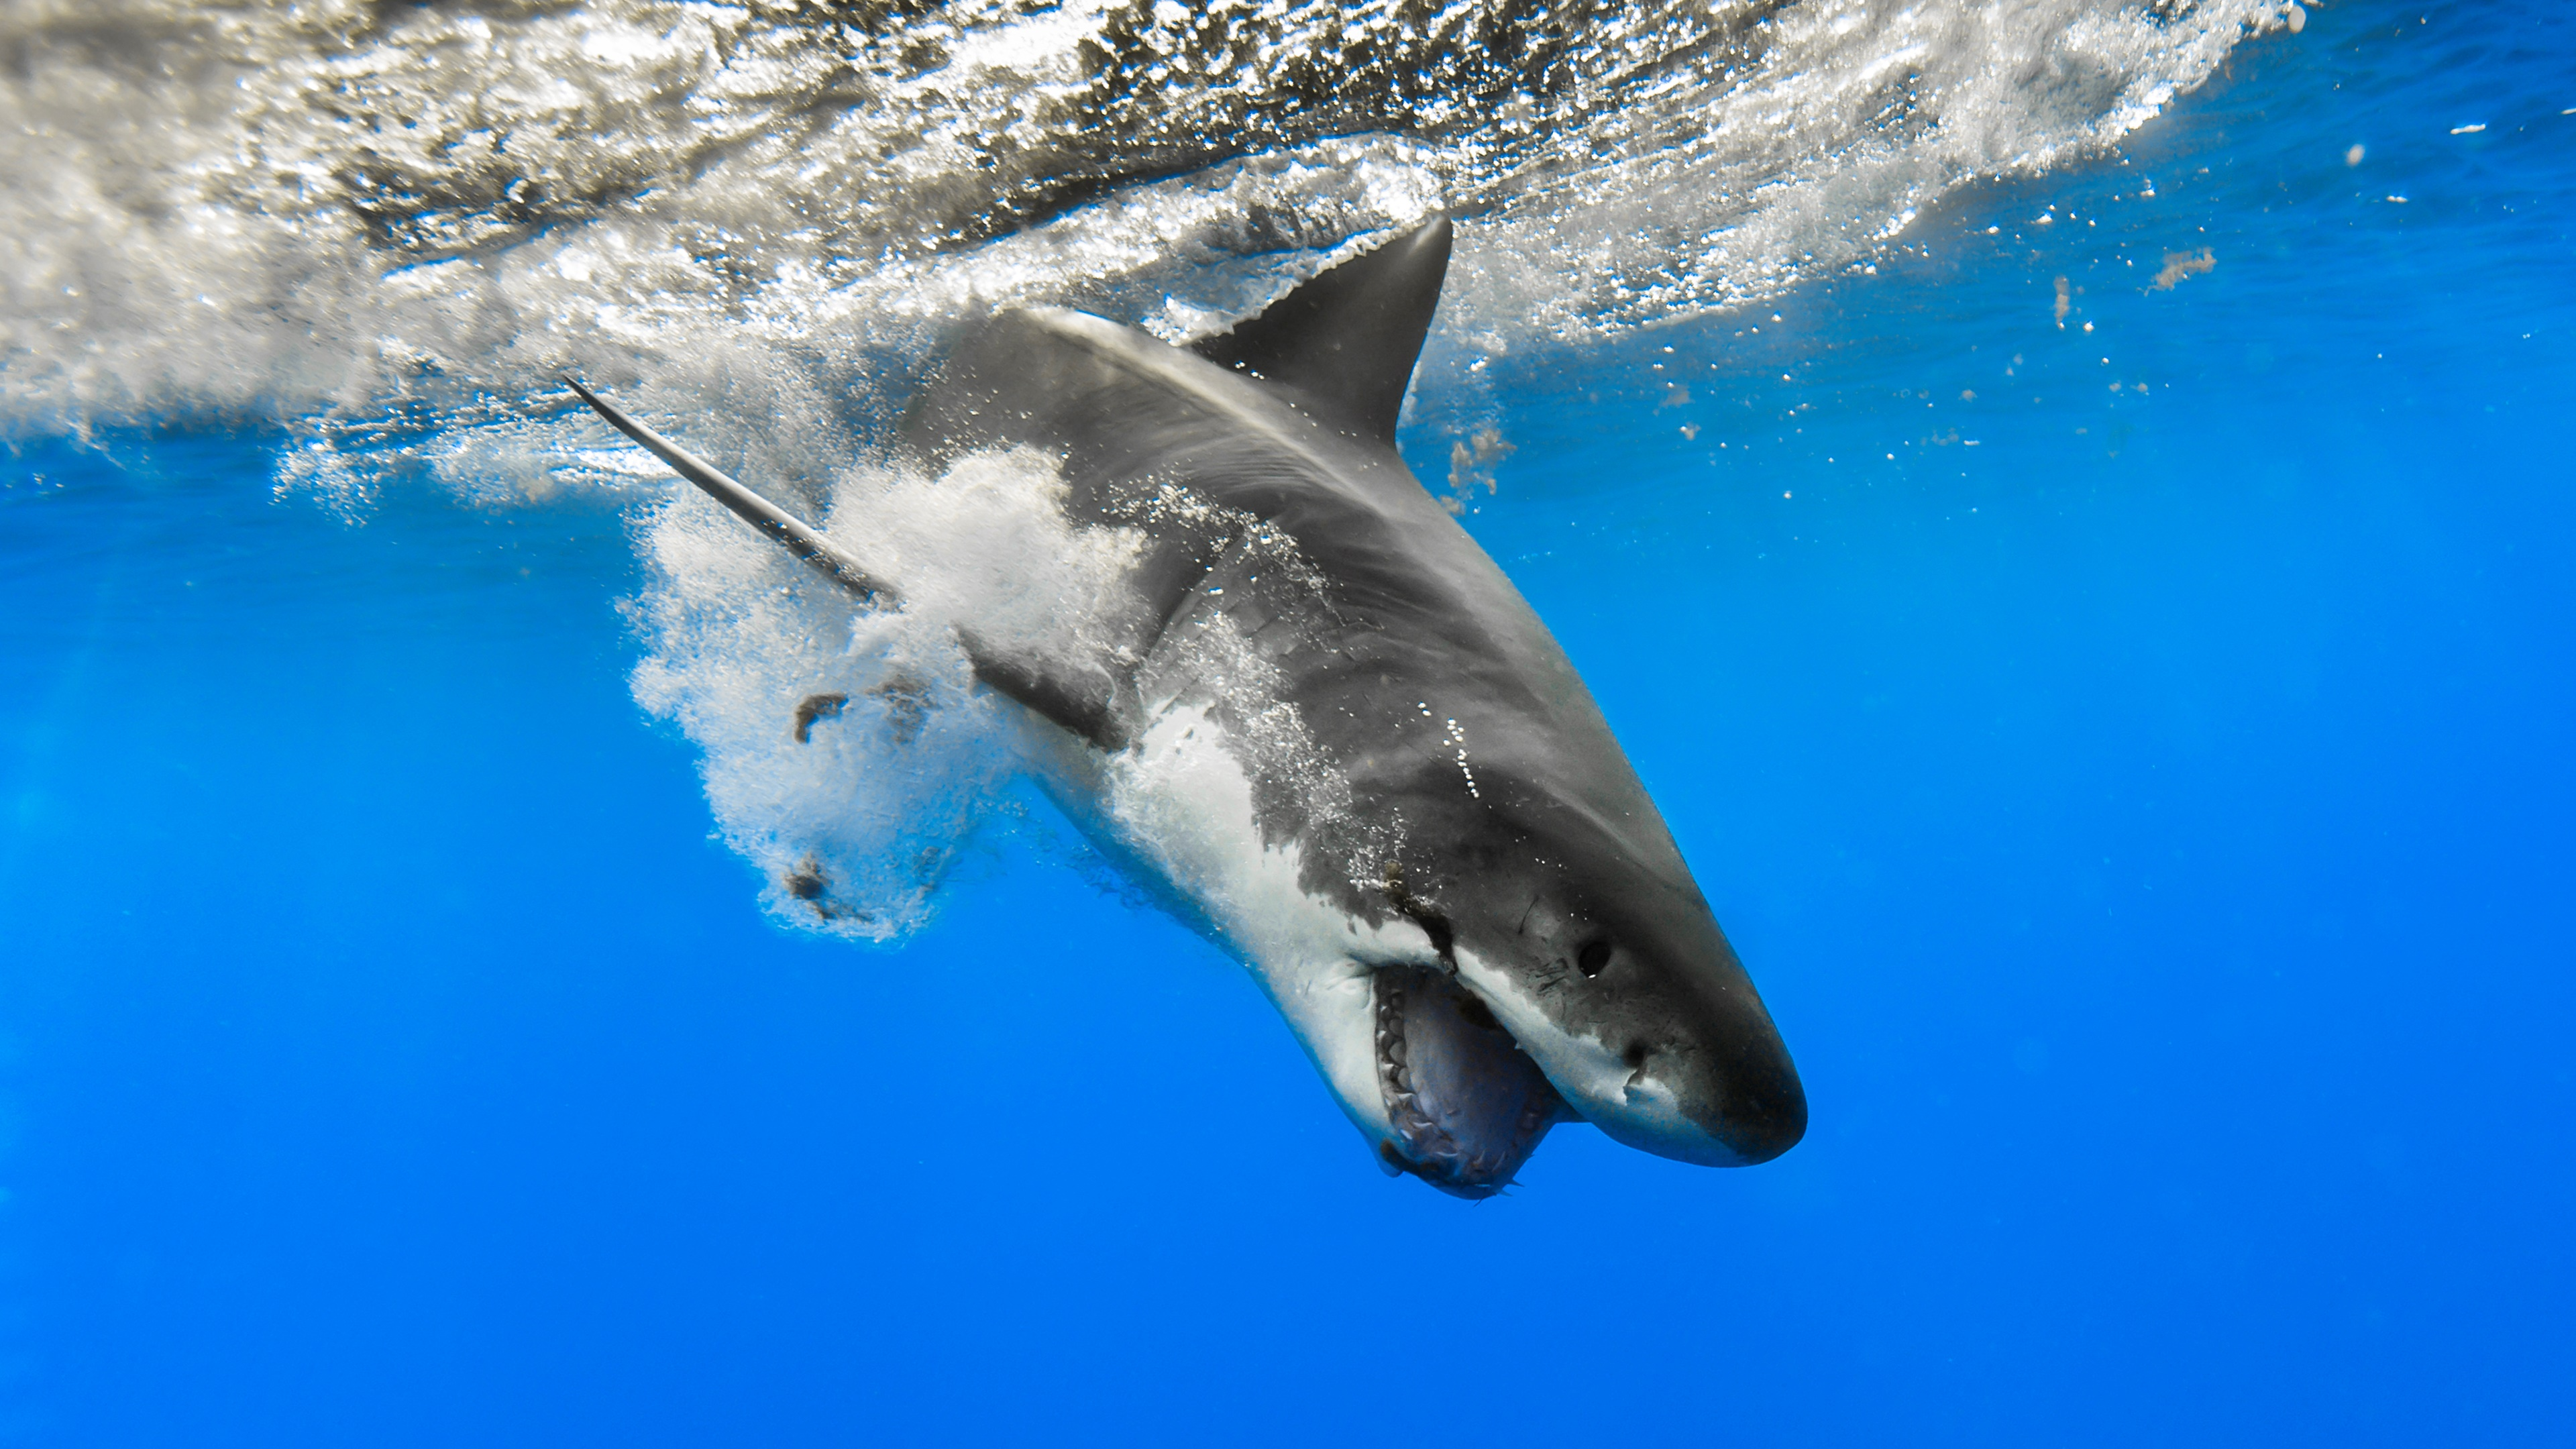 Great White Shark 4k Ultra Fondo De Pantalla Hd Fondo De